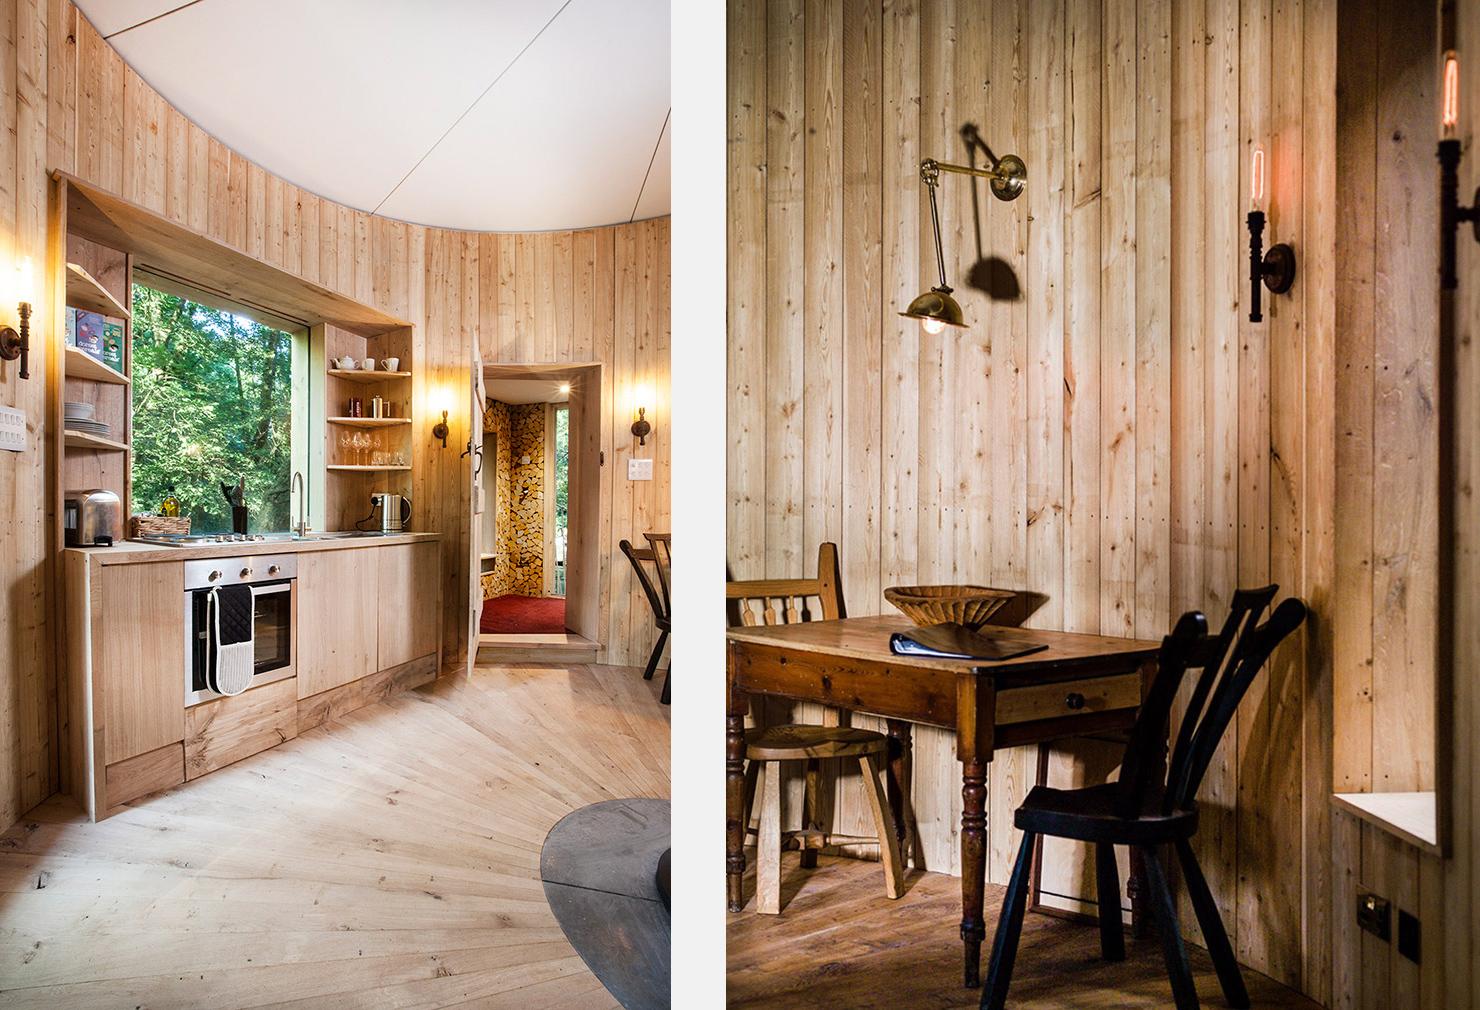 The woodsman's treehouse in Dorset, UK